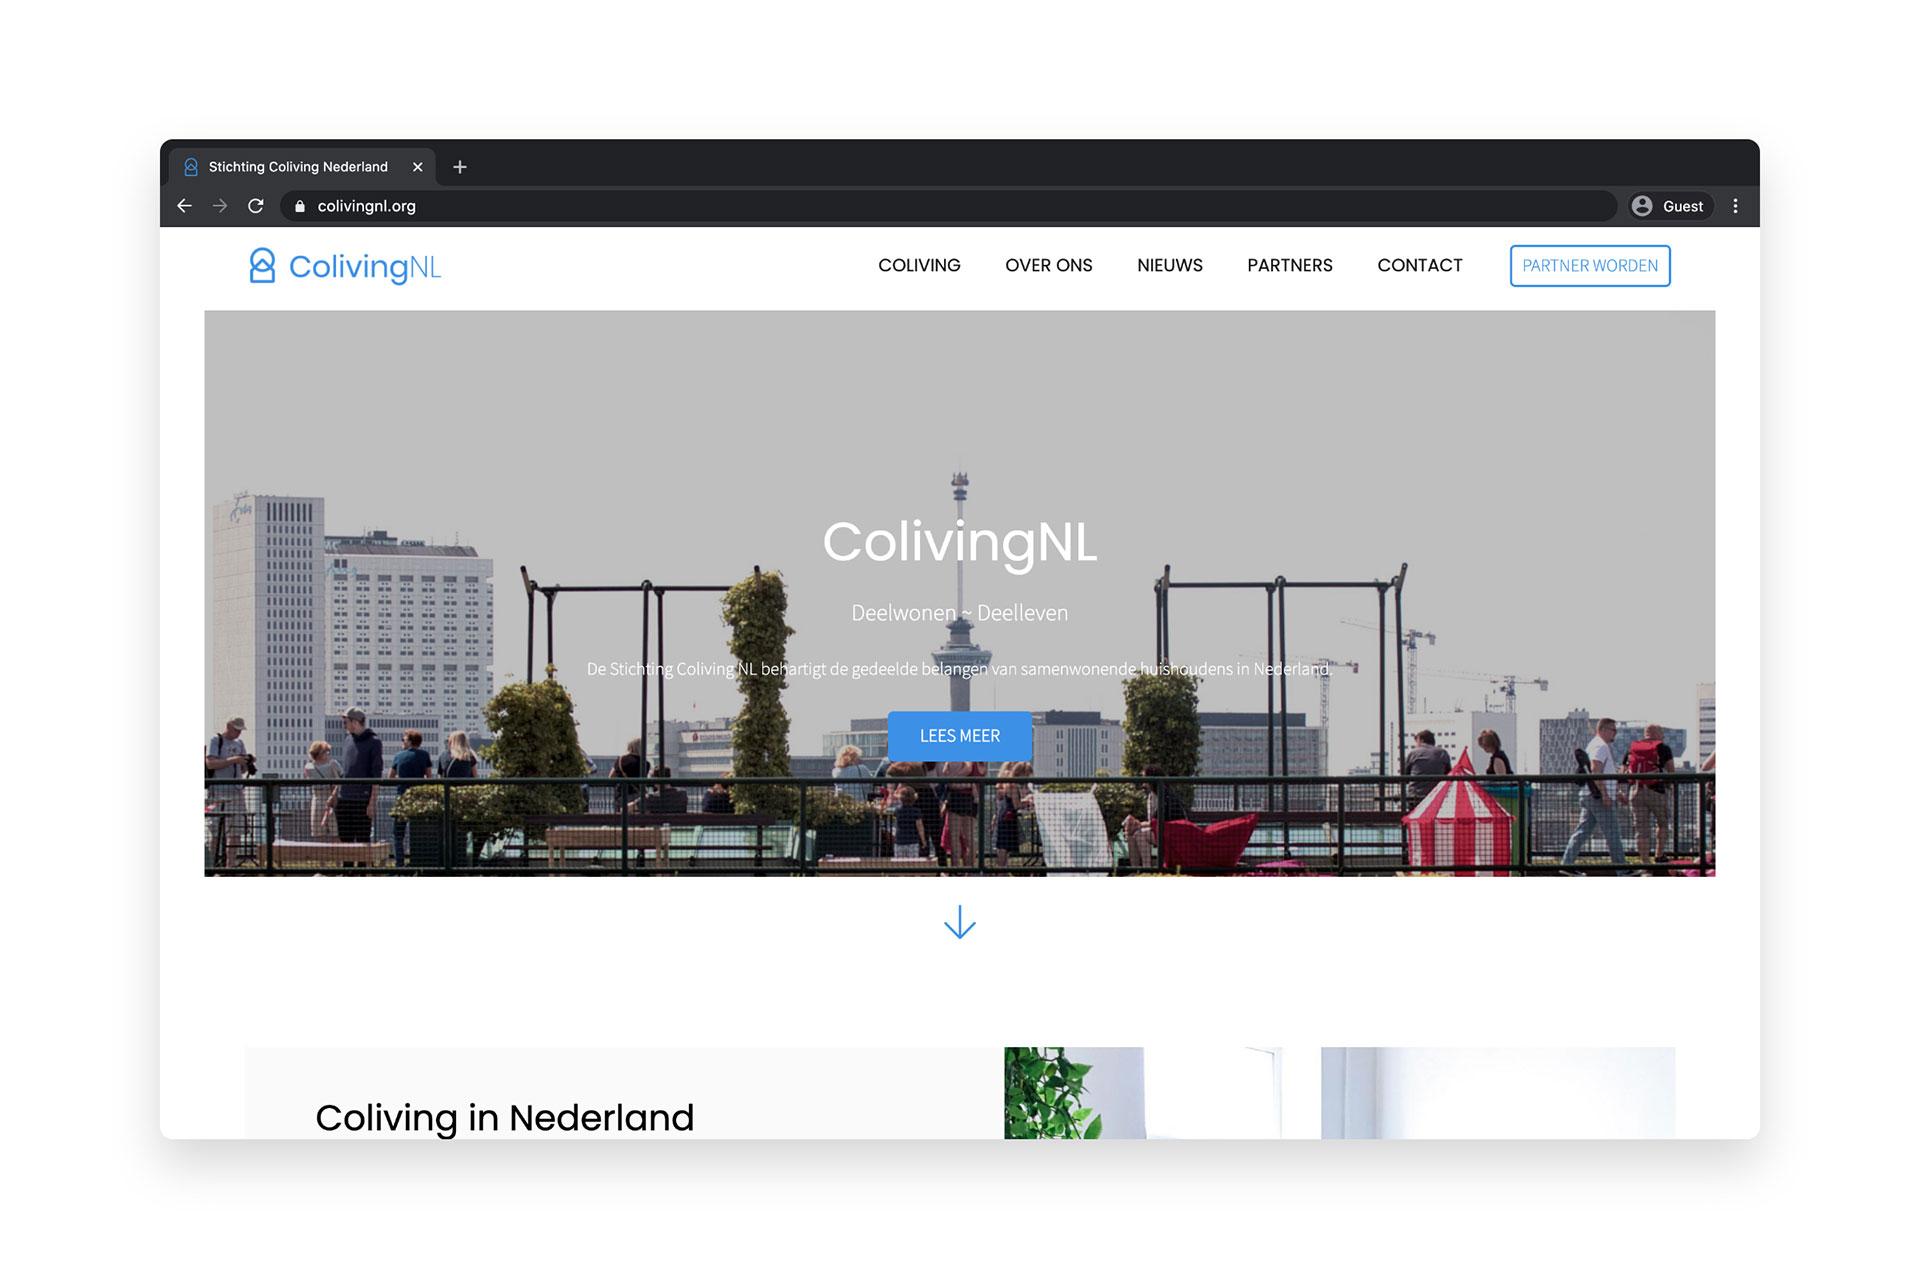 ColivingNL website design by SPX: homepage